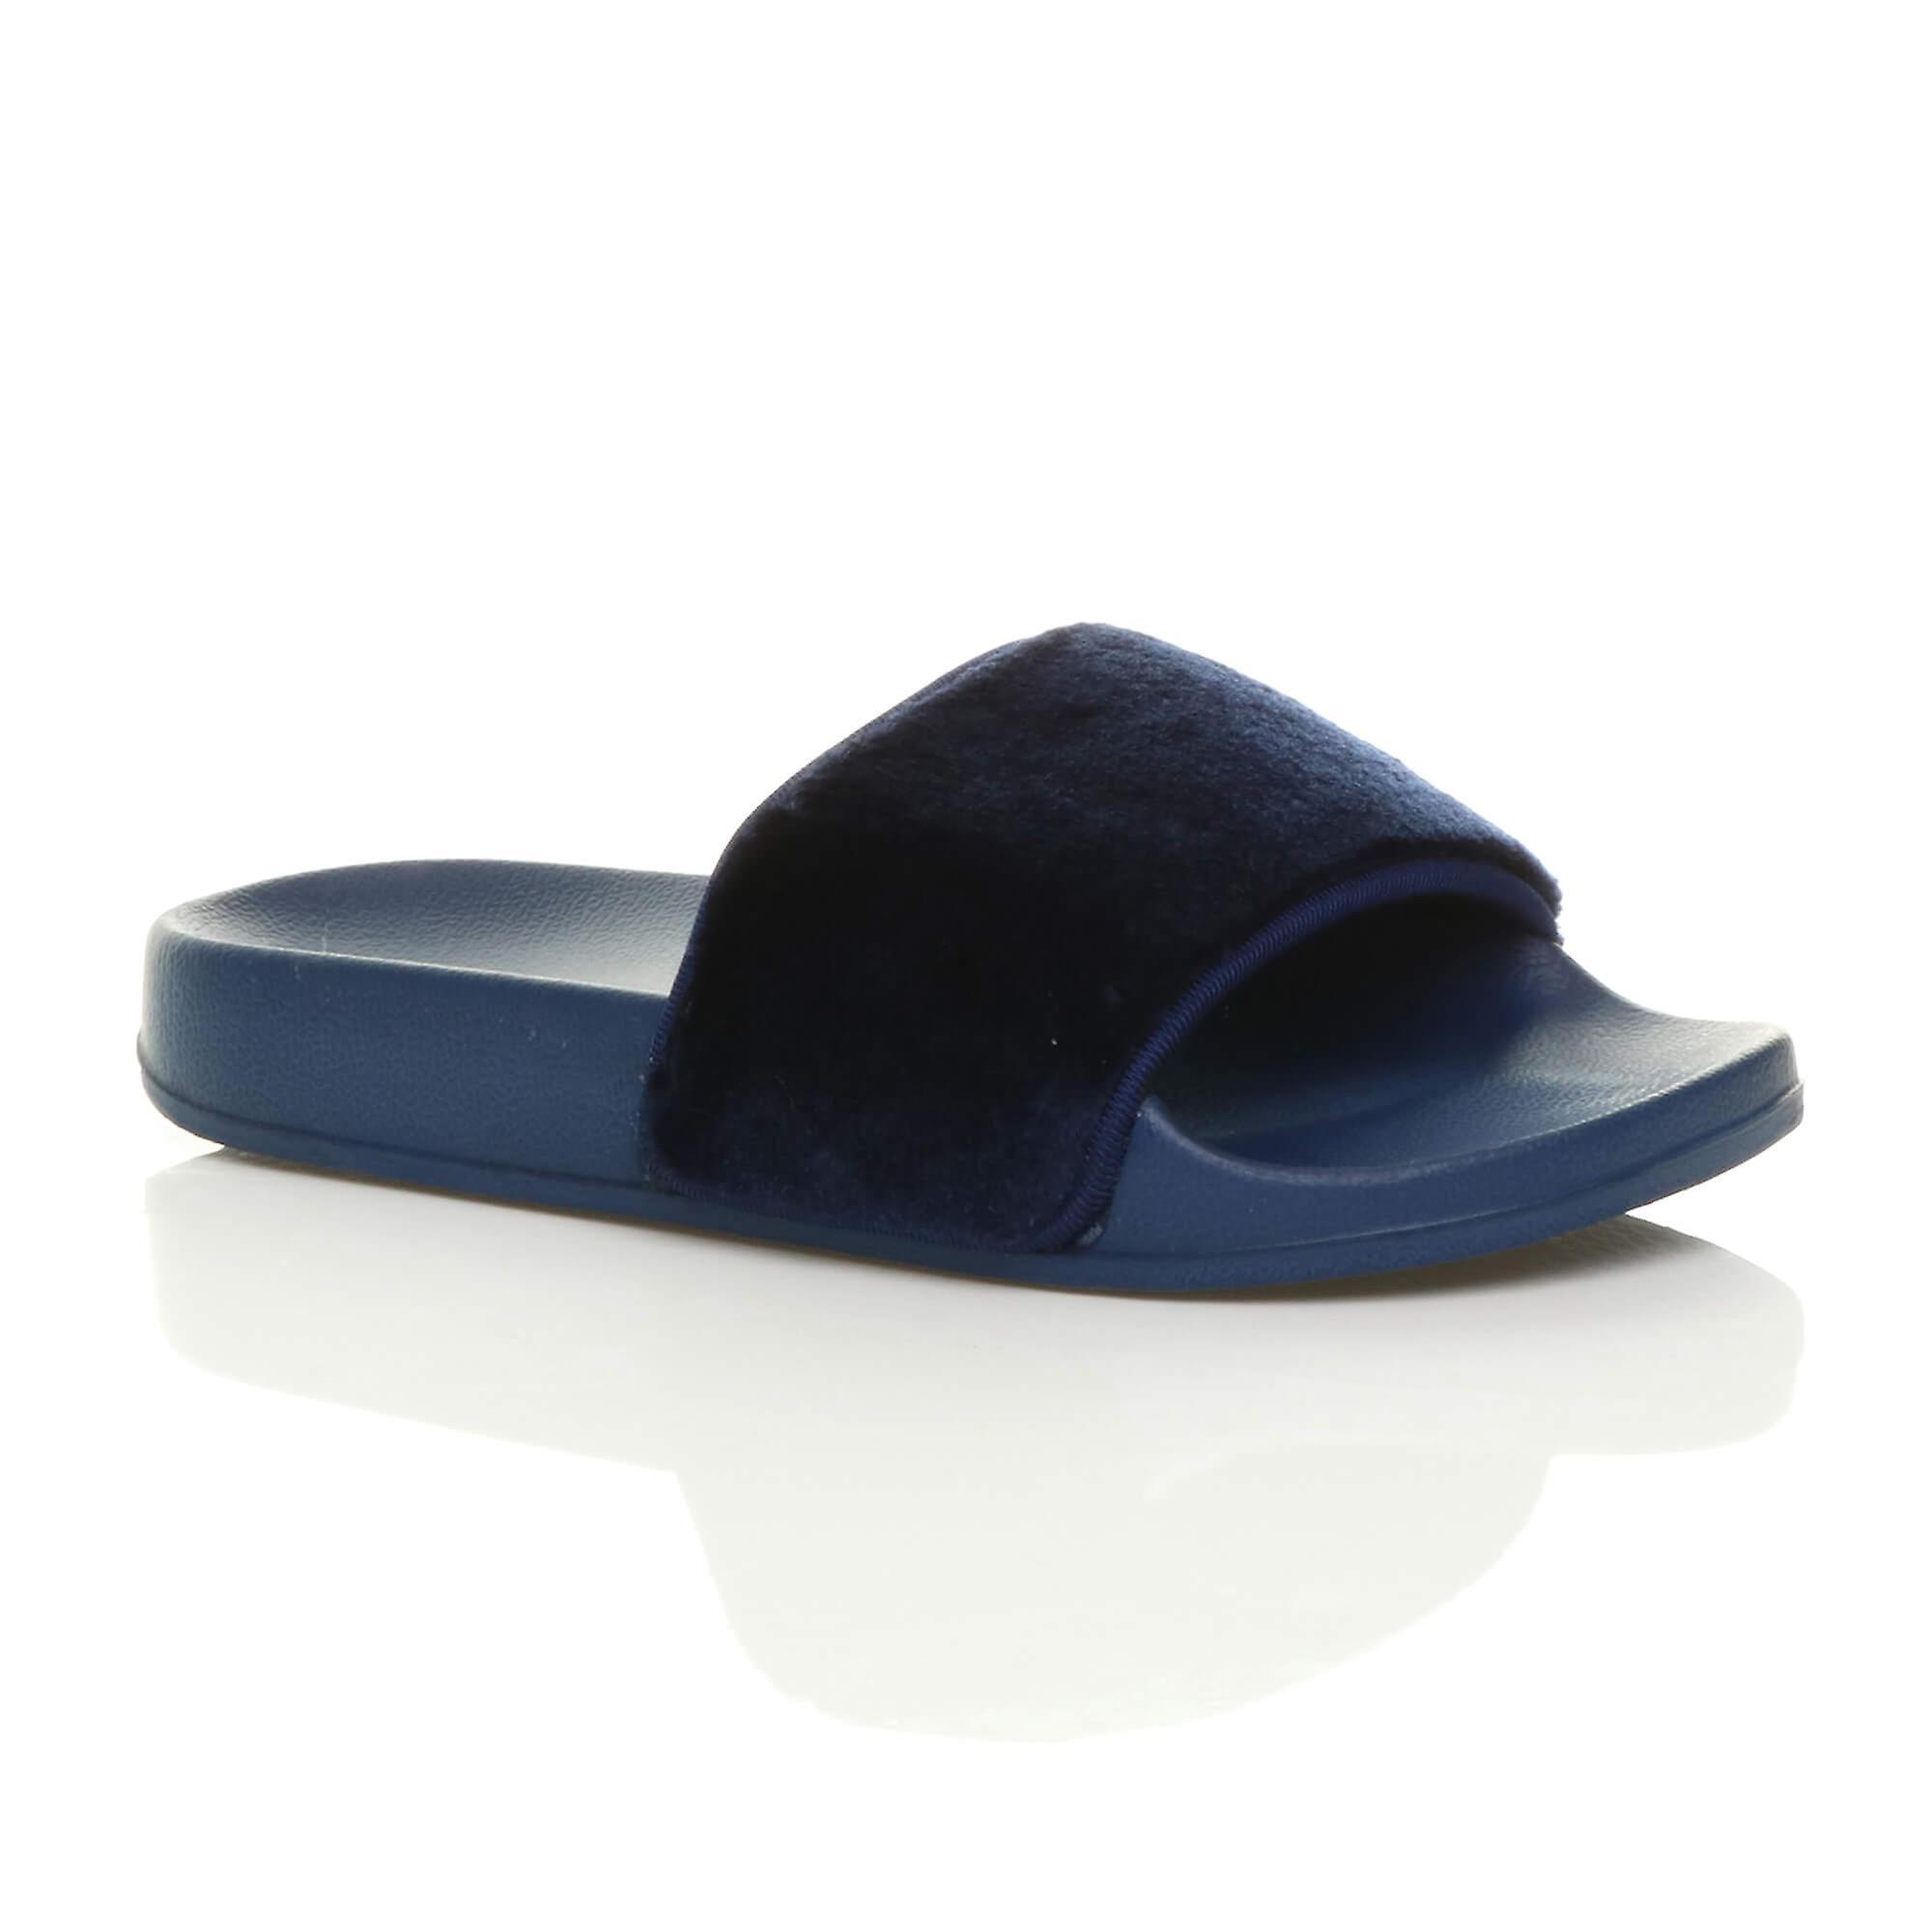 Women Furry Slip On Flat Slippers Slider Ladies Comfy Flip Flop Sandals Shoes US